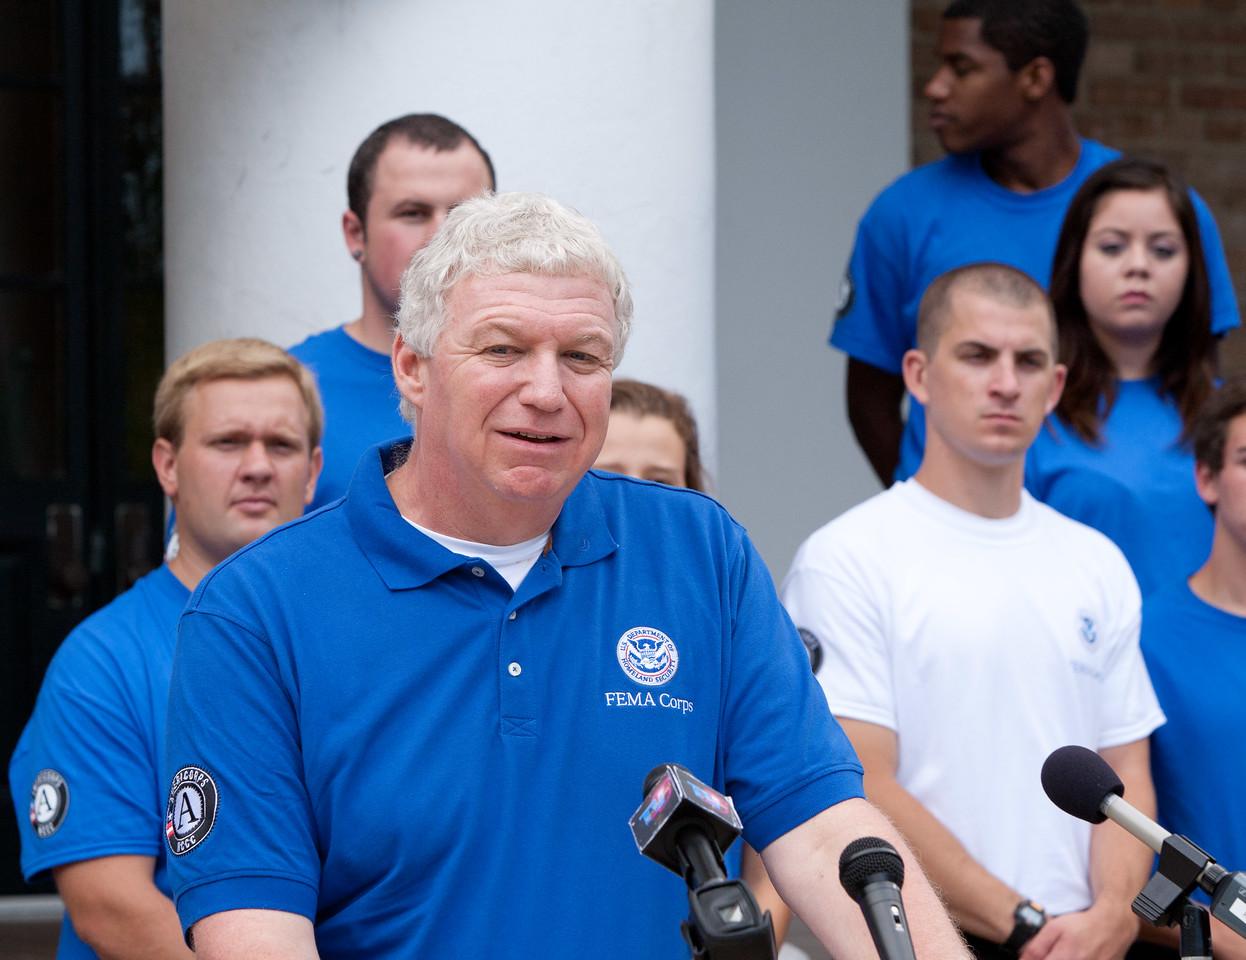 FEMA Deputy Administrator, Richard Serino. Corporation for National and Community Service Photo.